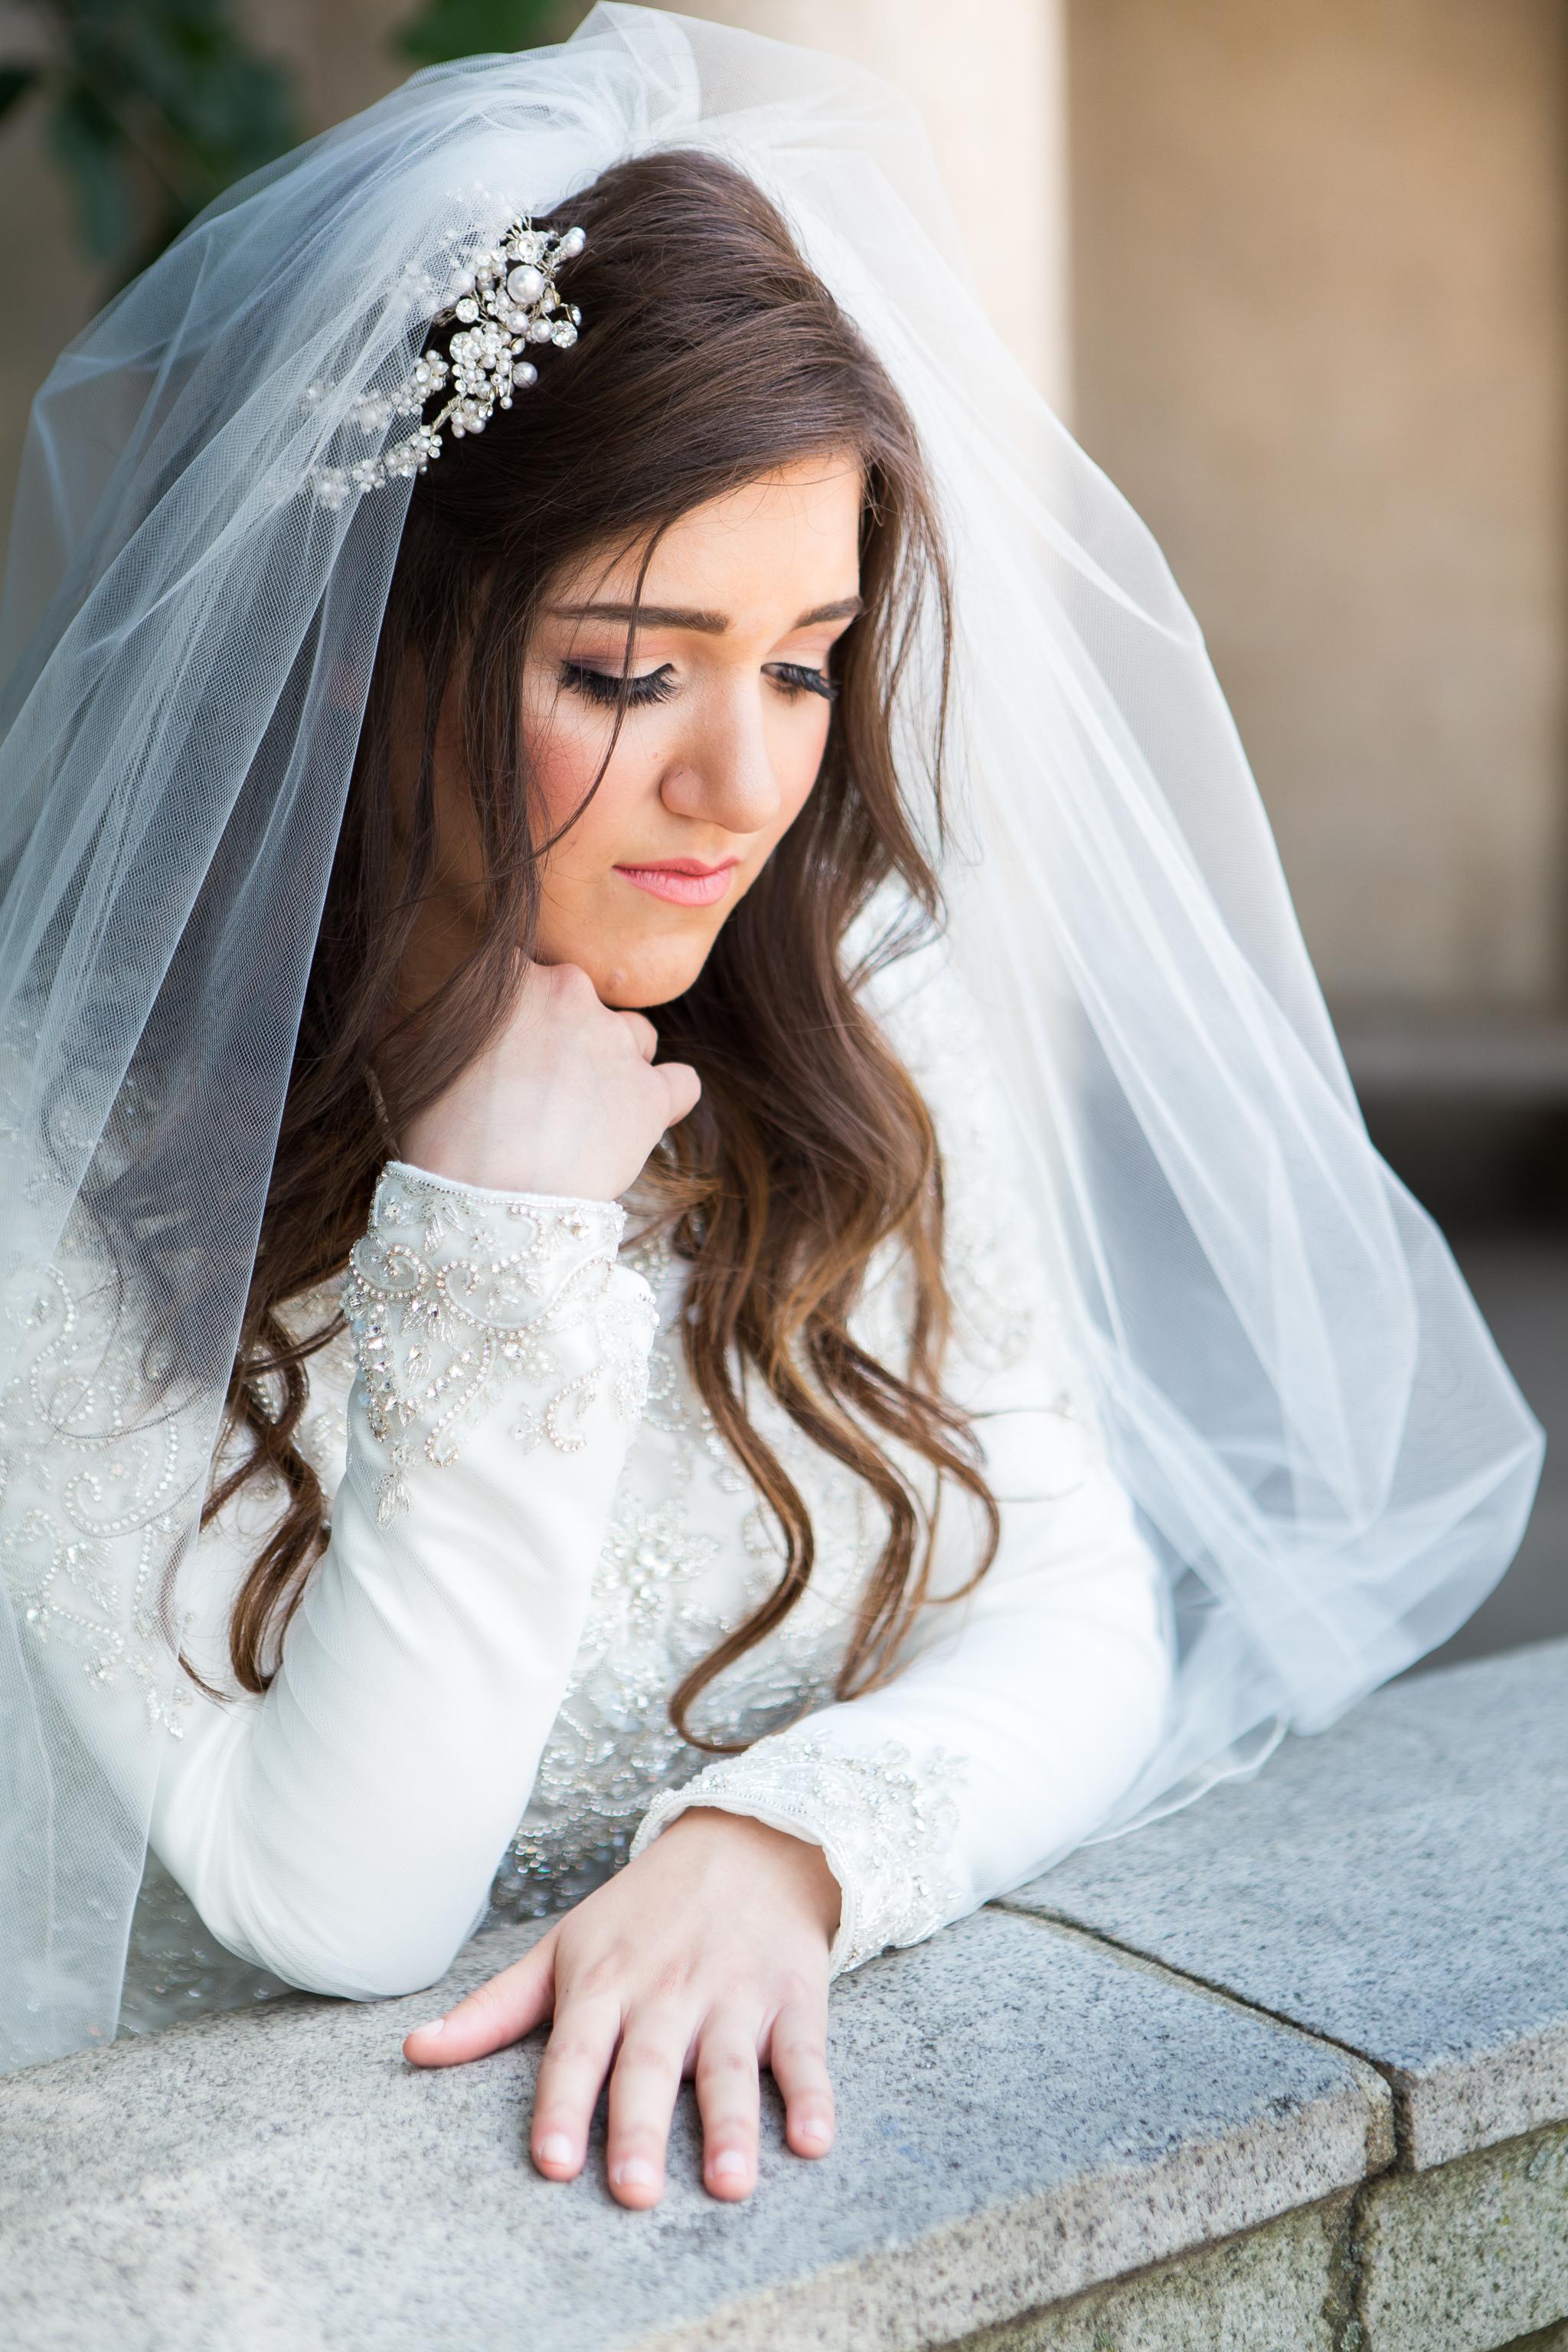 Wedding Iossi and Gitty Khafif  - Eliau Piha studio photography, new york, events, people 770 brooklyn -0127.jpg